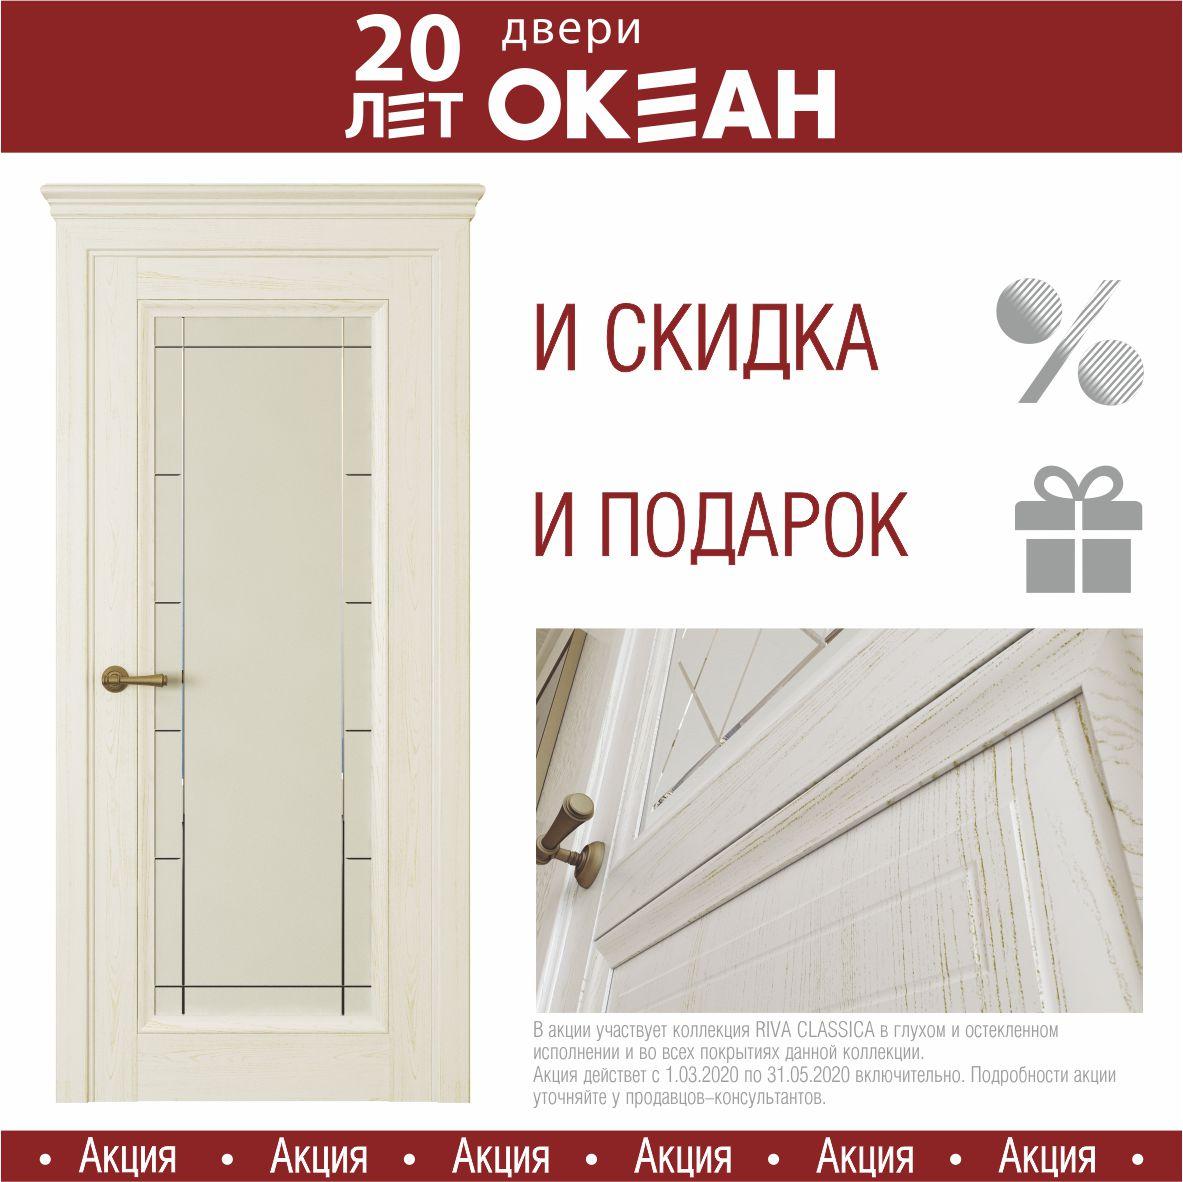 Ульяновские двери Океан RIVA CLASSICA со скидками и подарками фото картинки